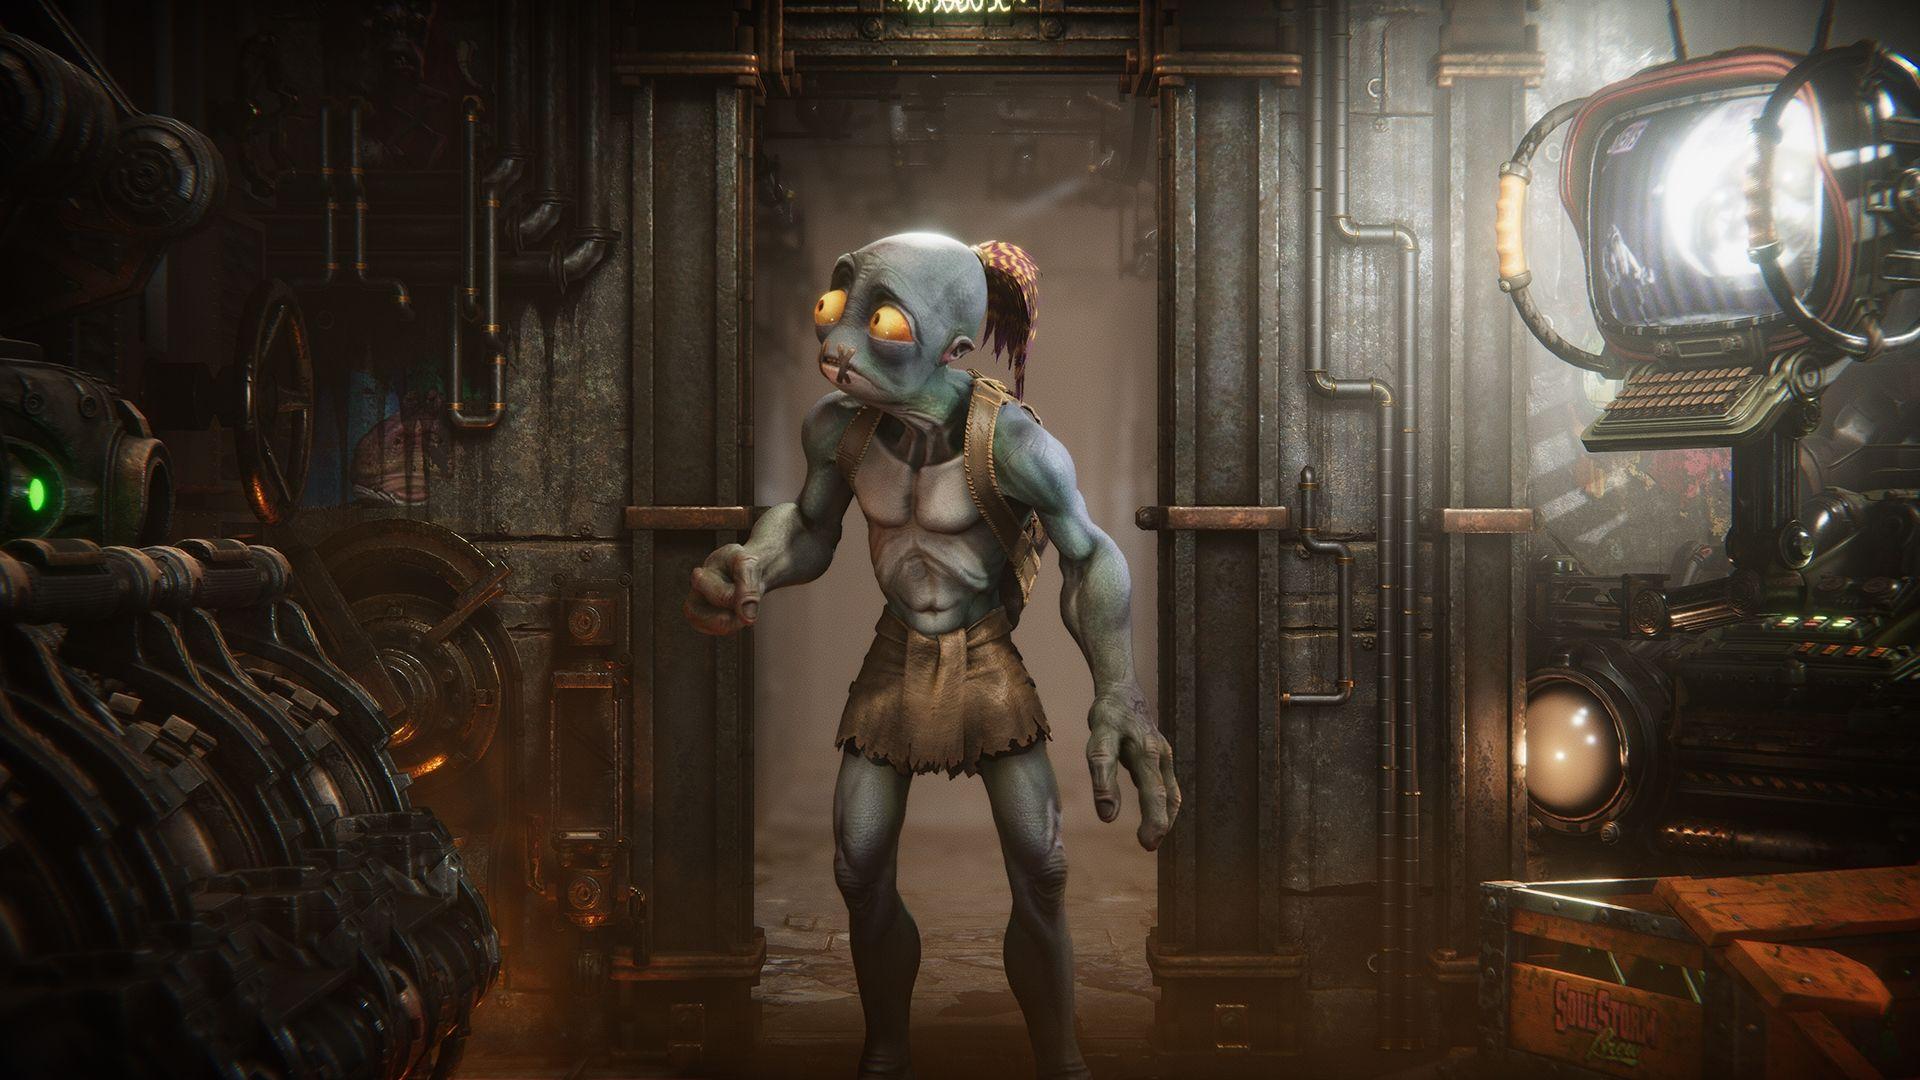 oddworld soulstorm game wallpaper 73995